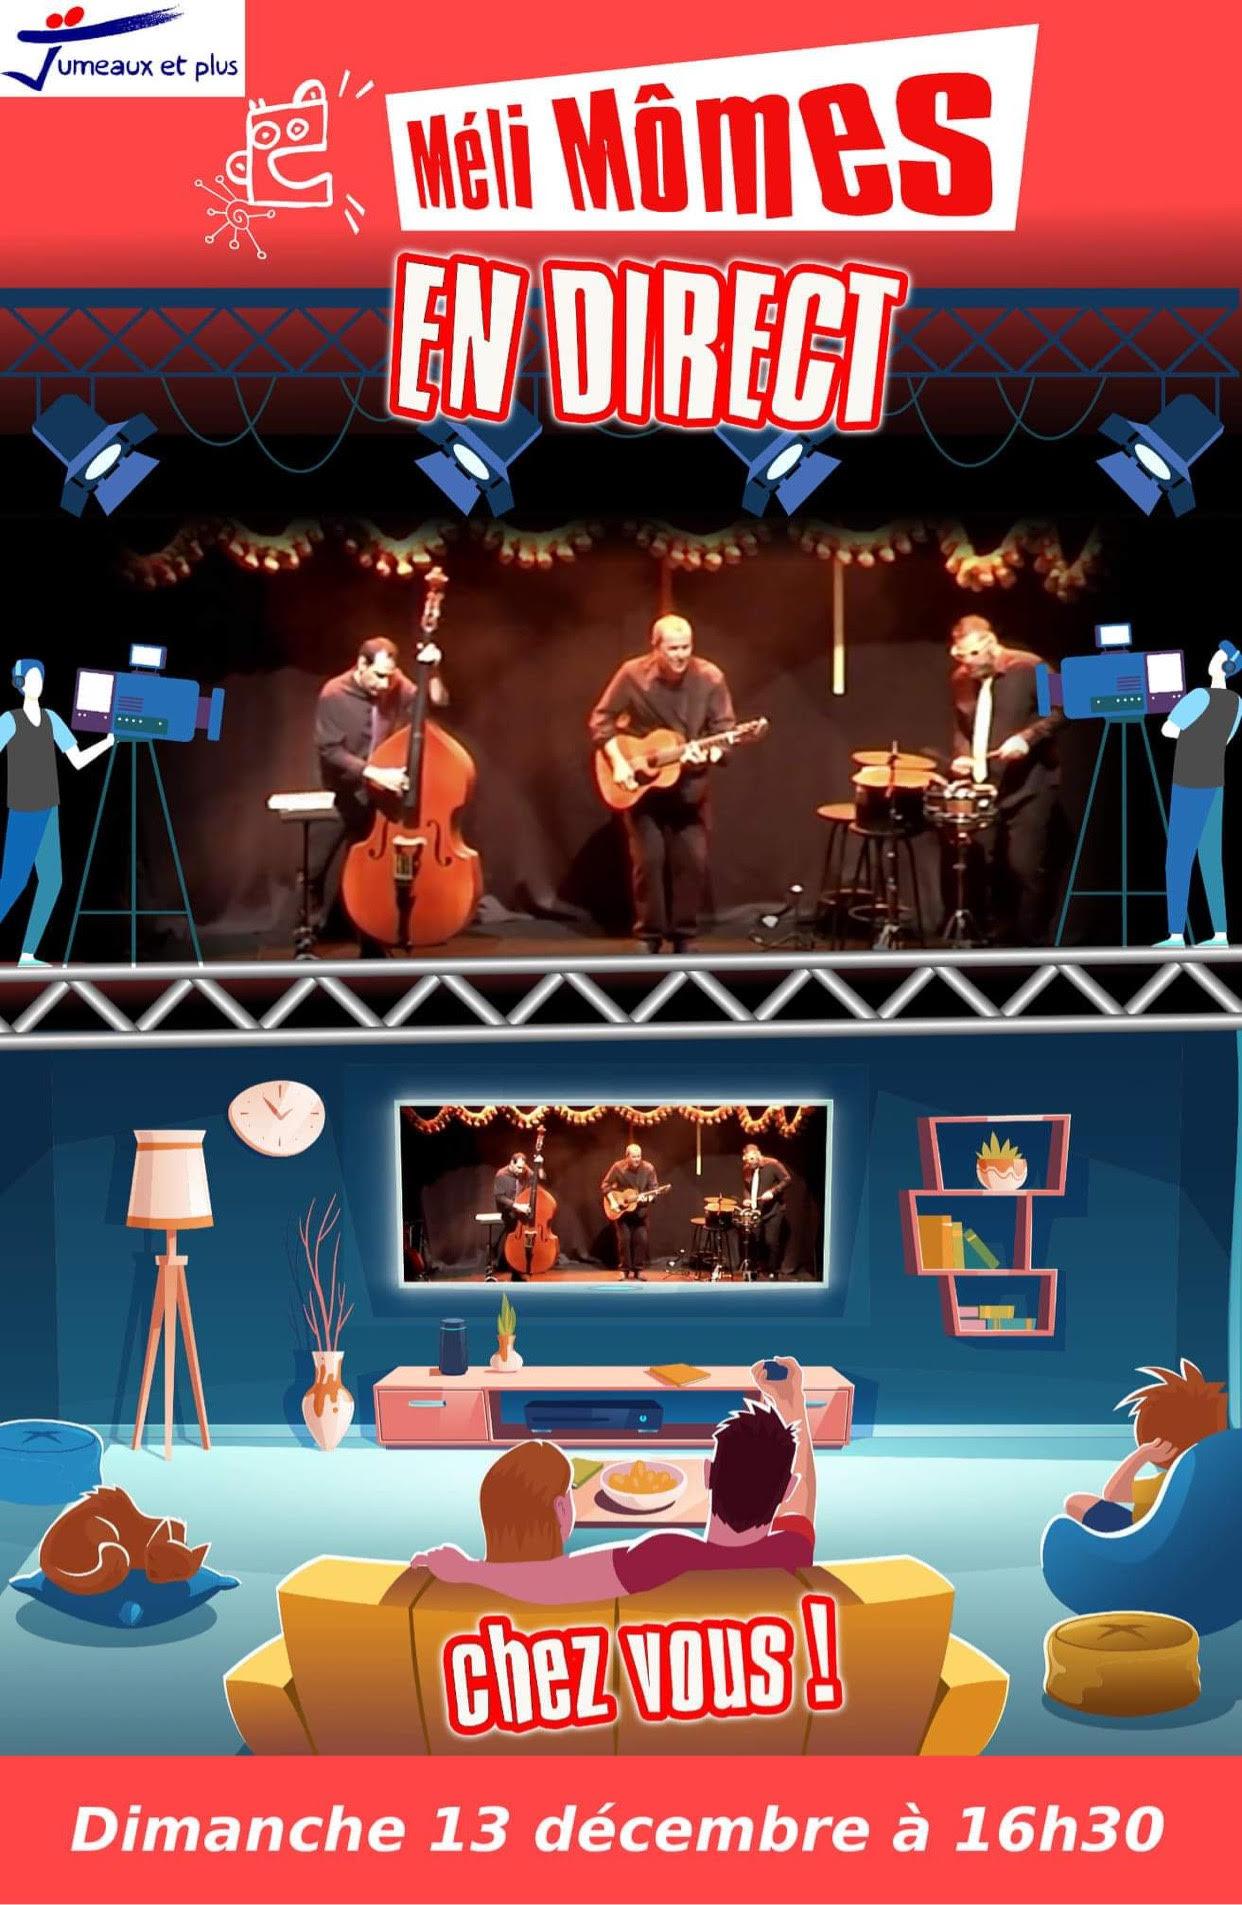 Concert des Méli-Mômes